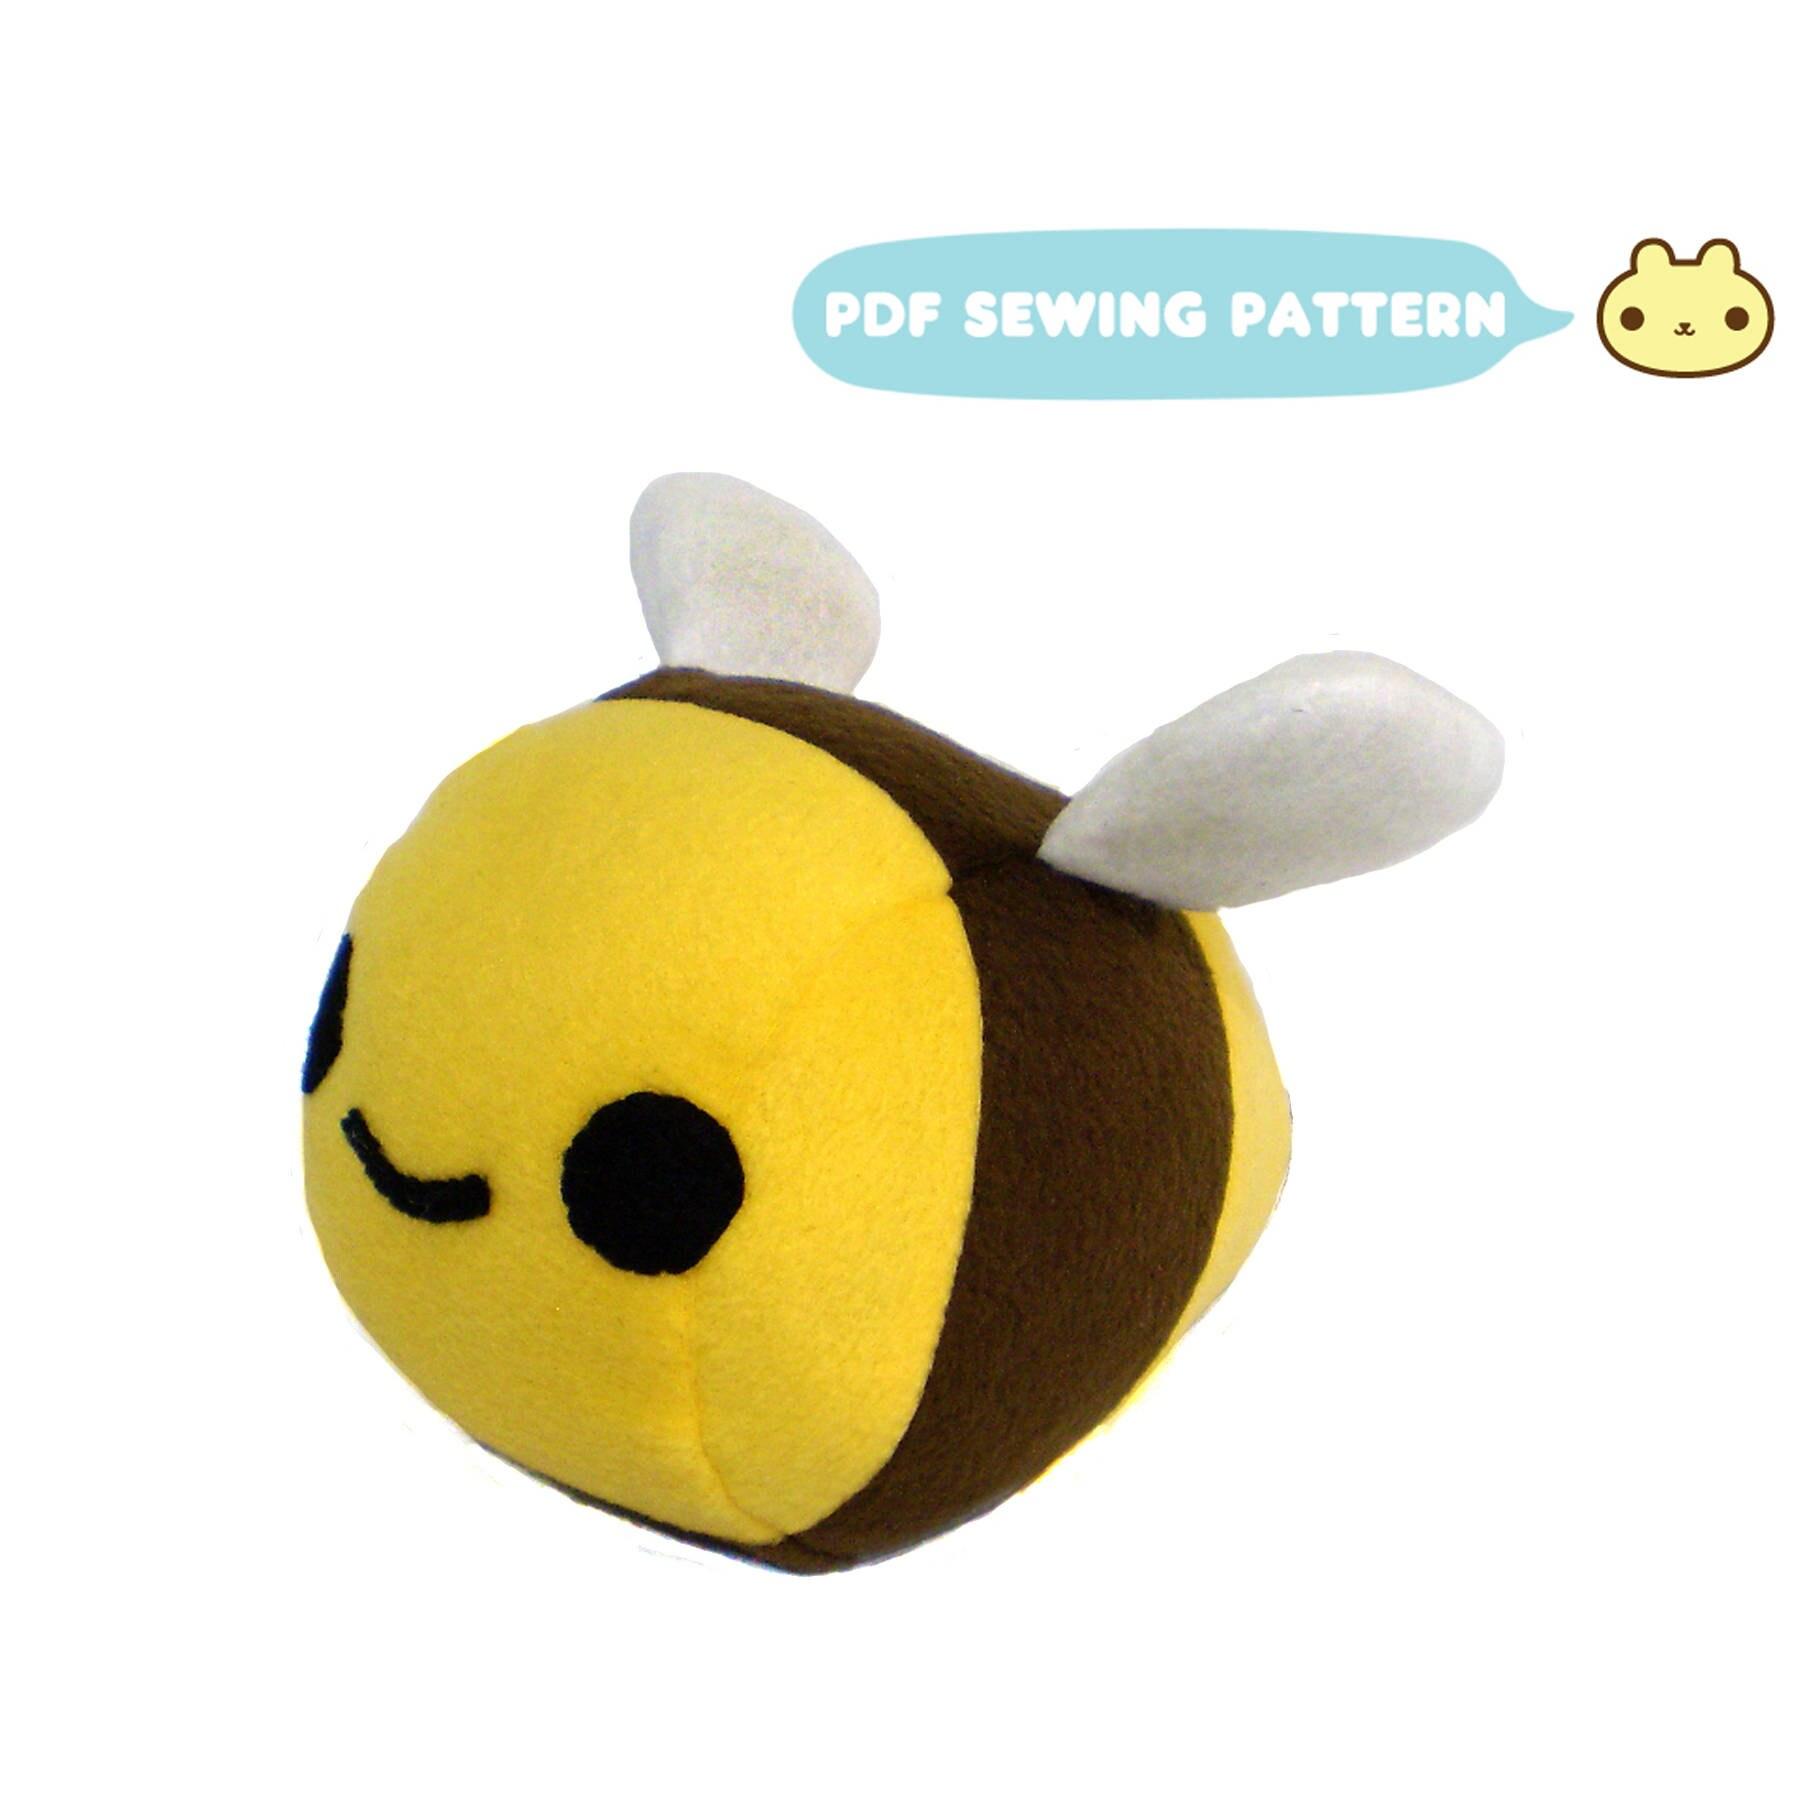 Bee Sewing Pattern Bee Plush Sewing Pattern Plush Bumble